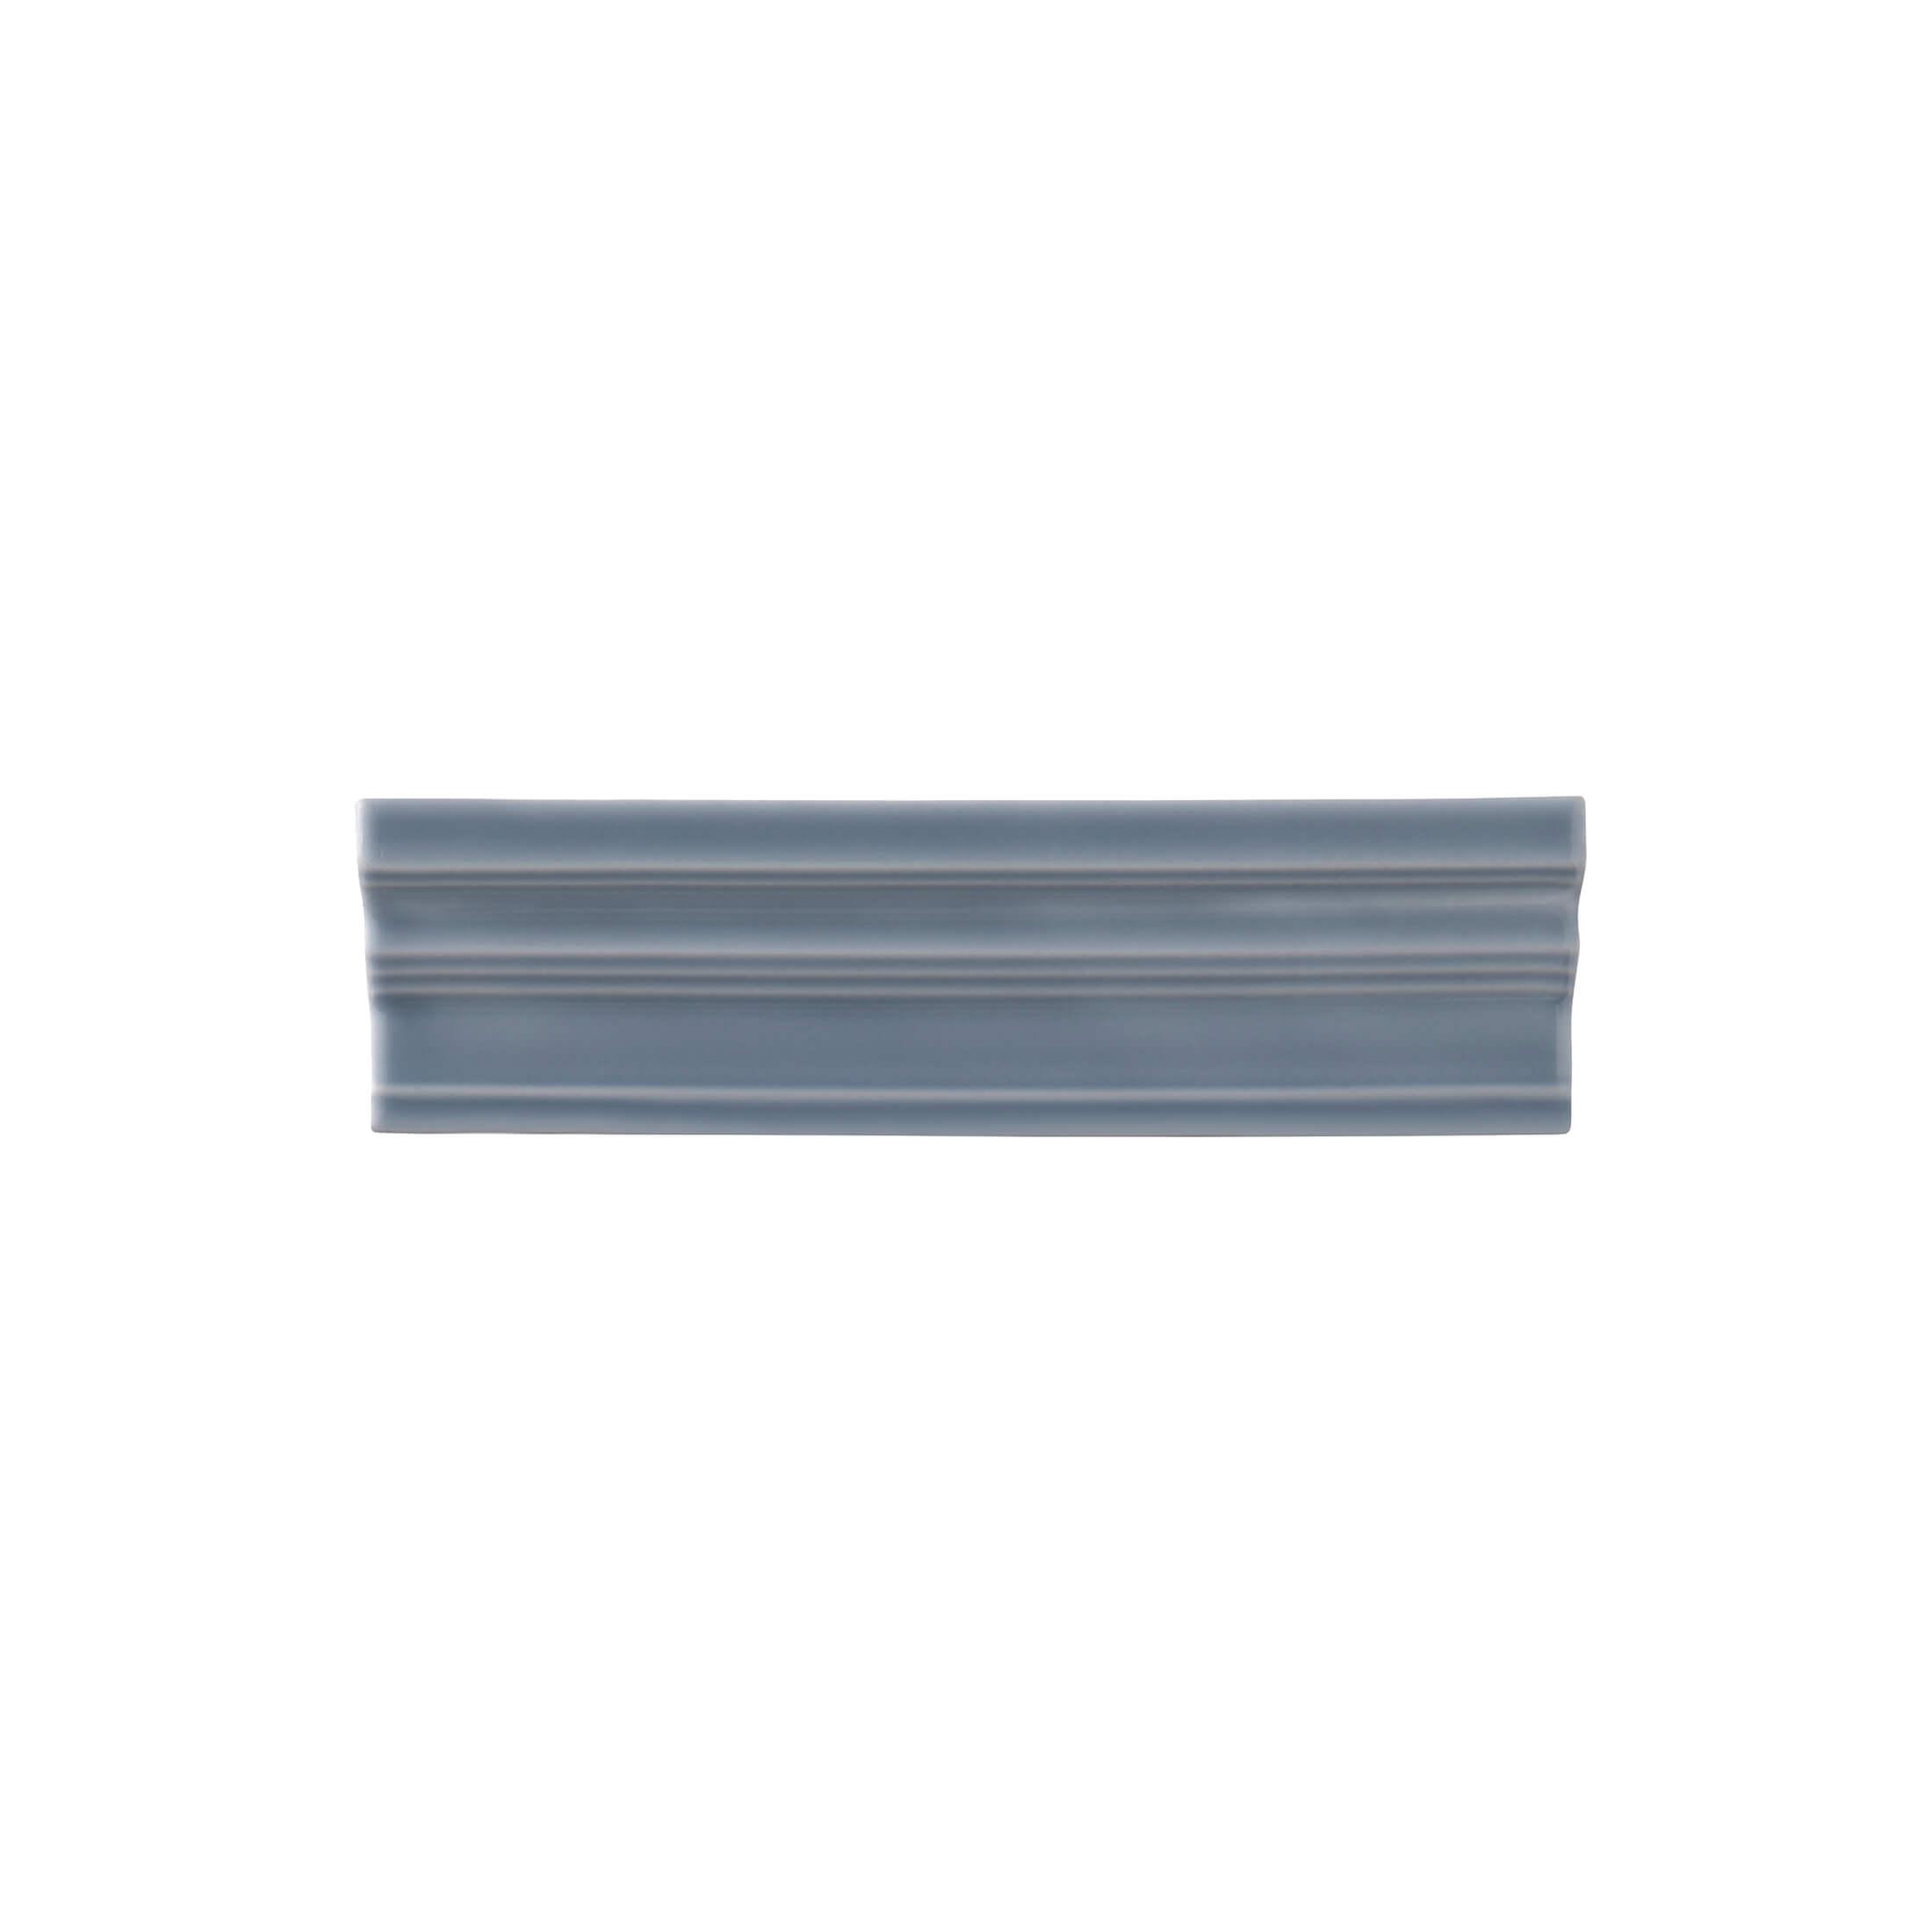 ADNE5589 - CORNISA CLASICA - 5 cm X 20 cm